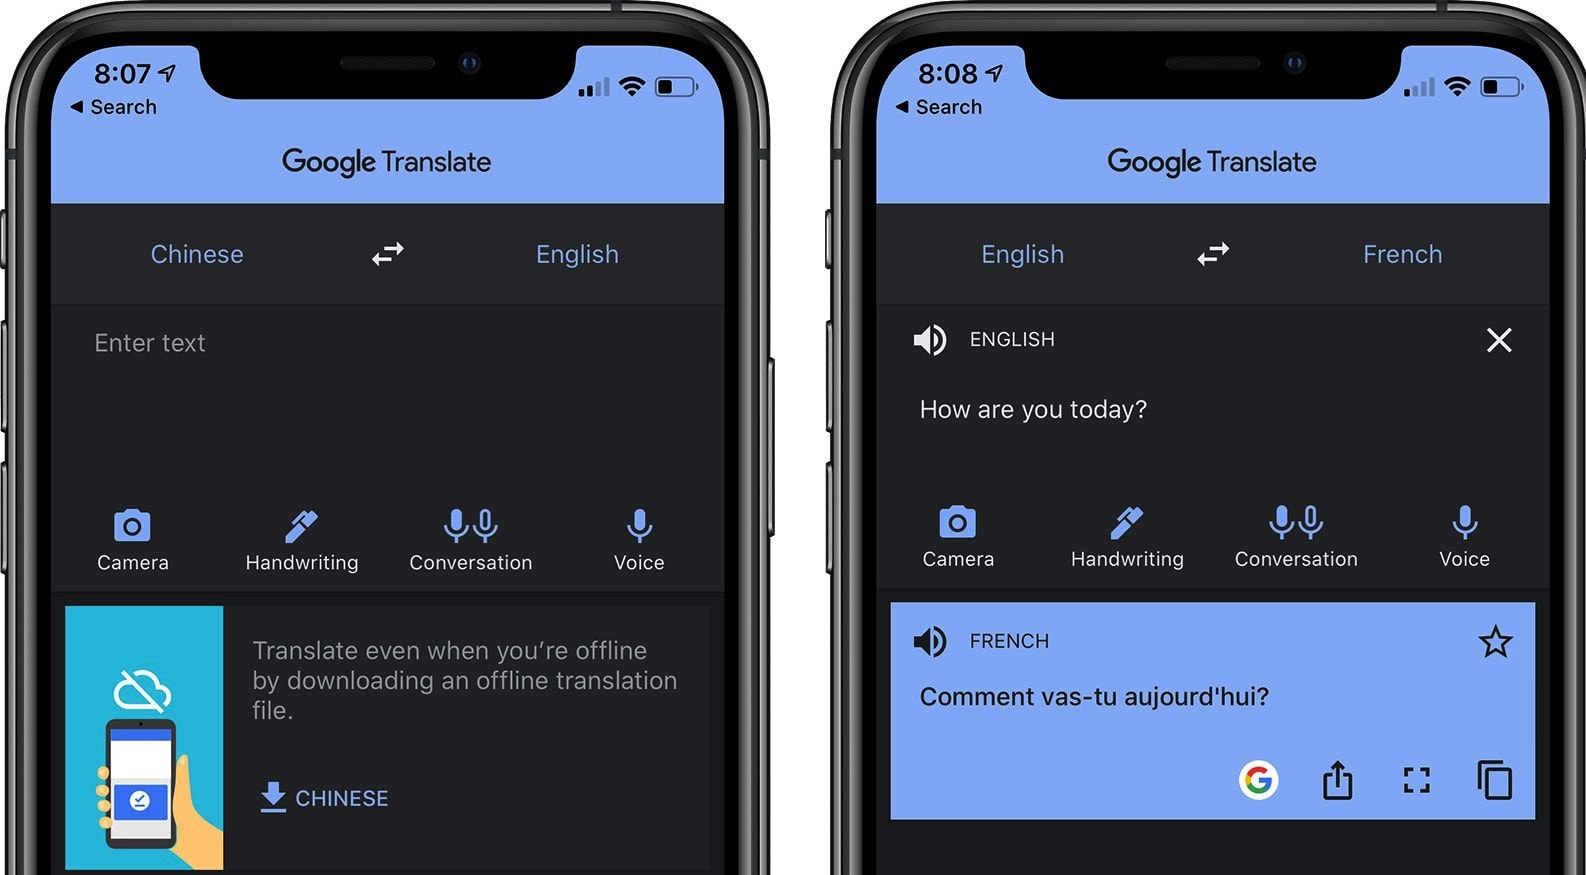 Mode sombre: Google Translate app finally gets Dark Mode option